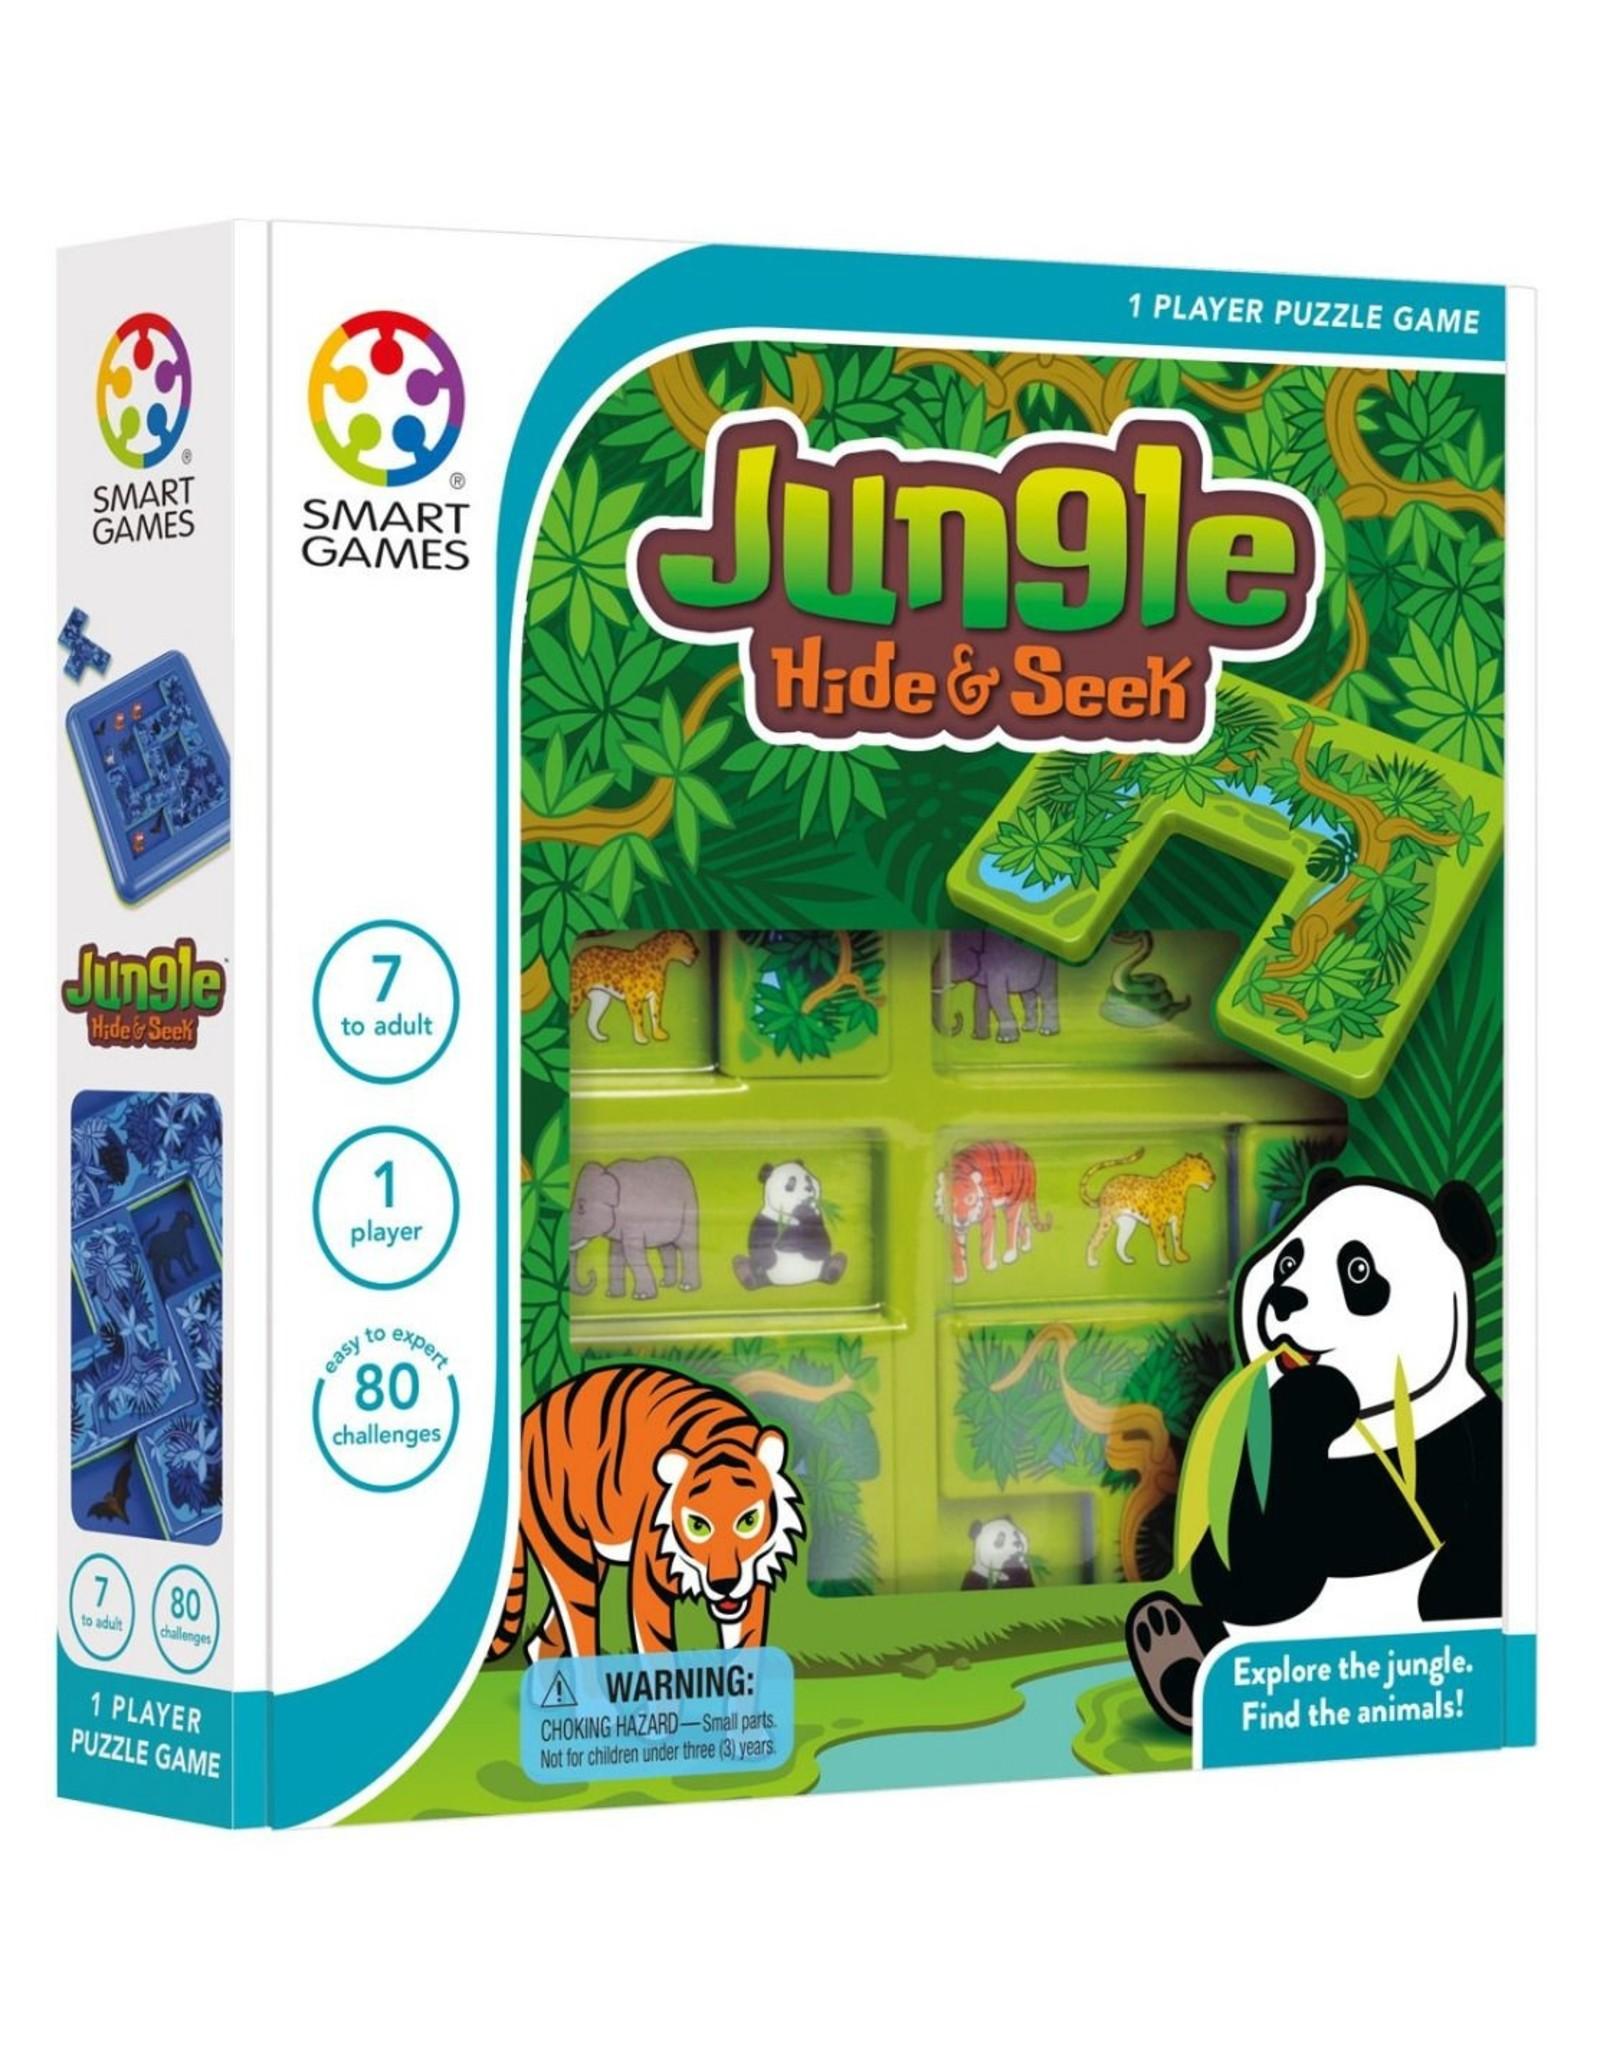 Smart Games Jungle Hide & Seek